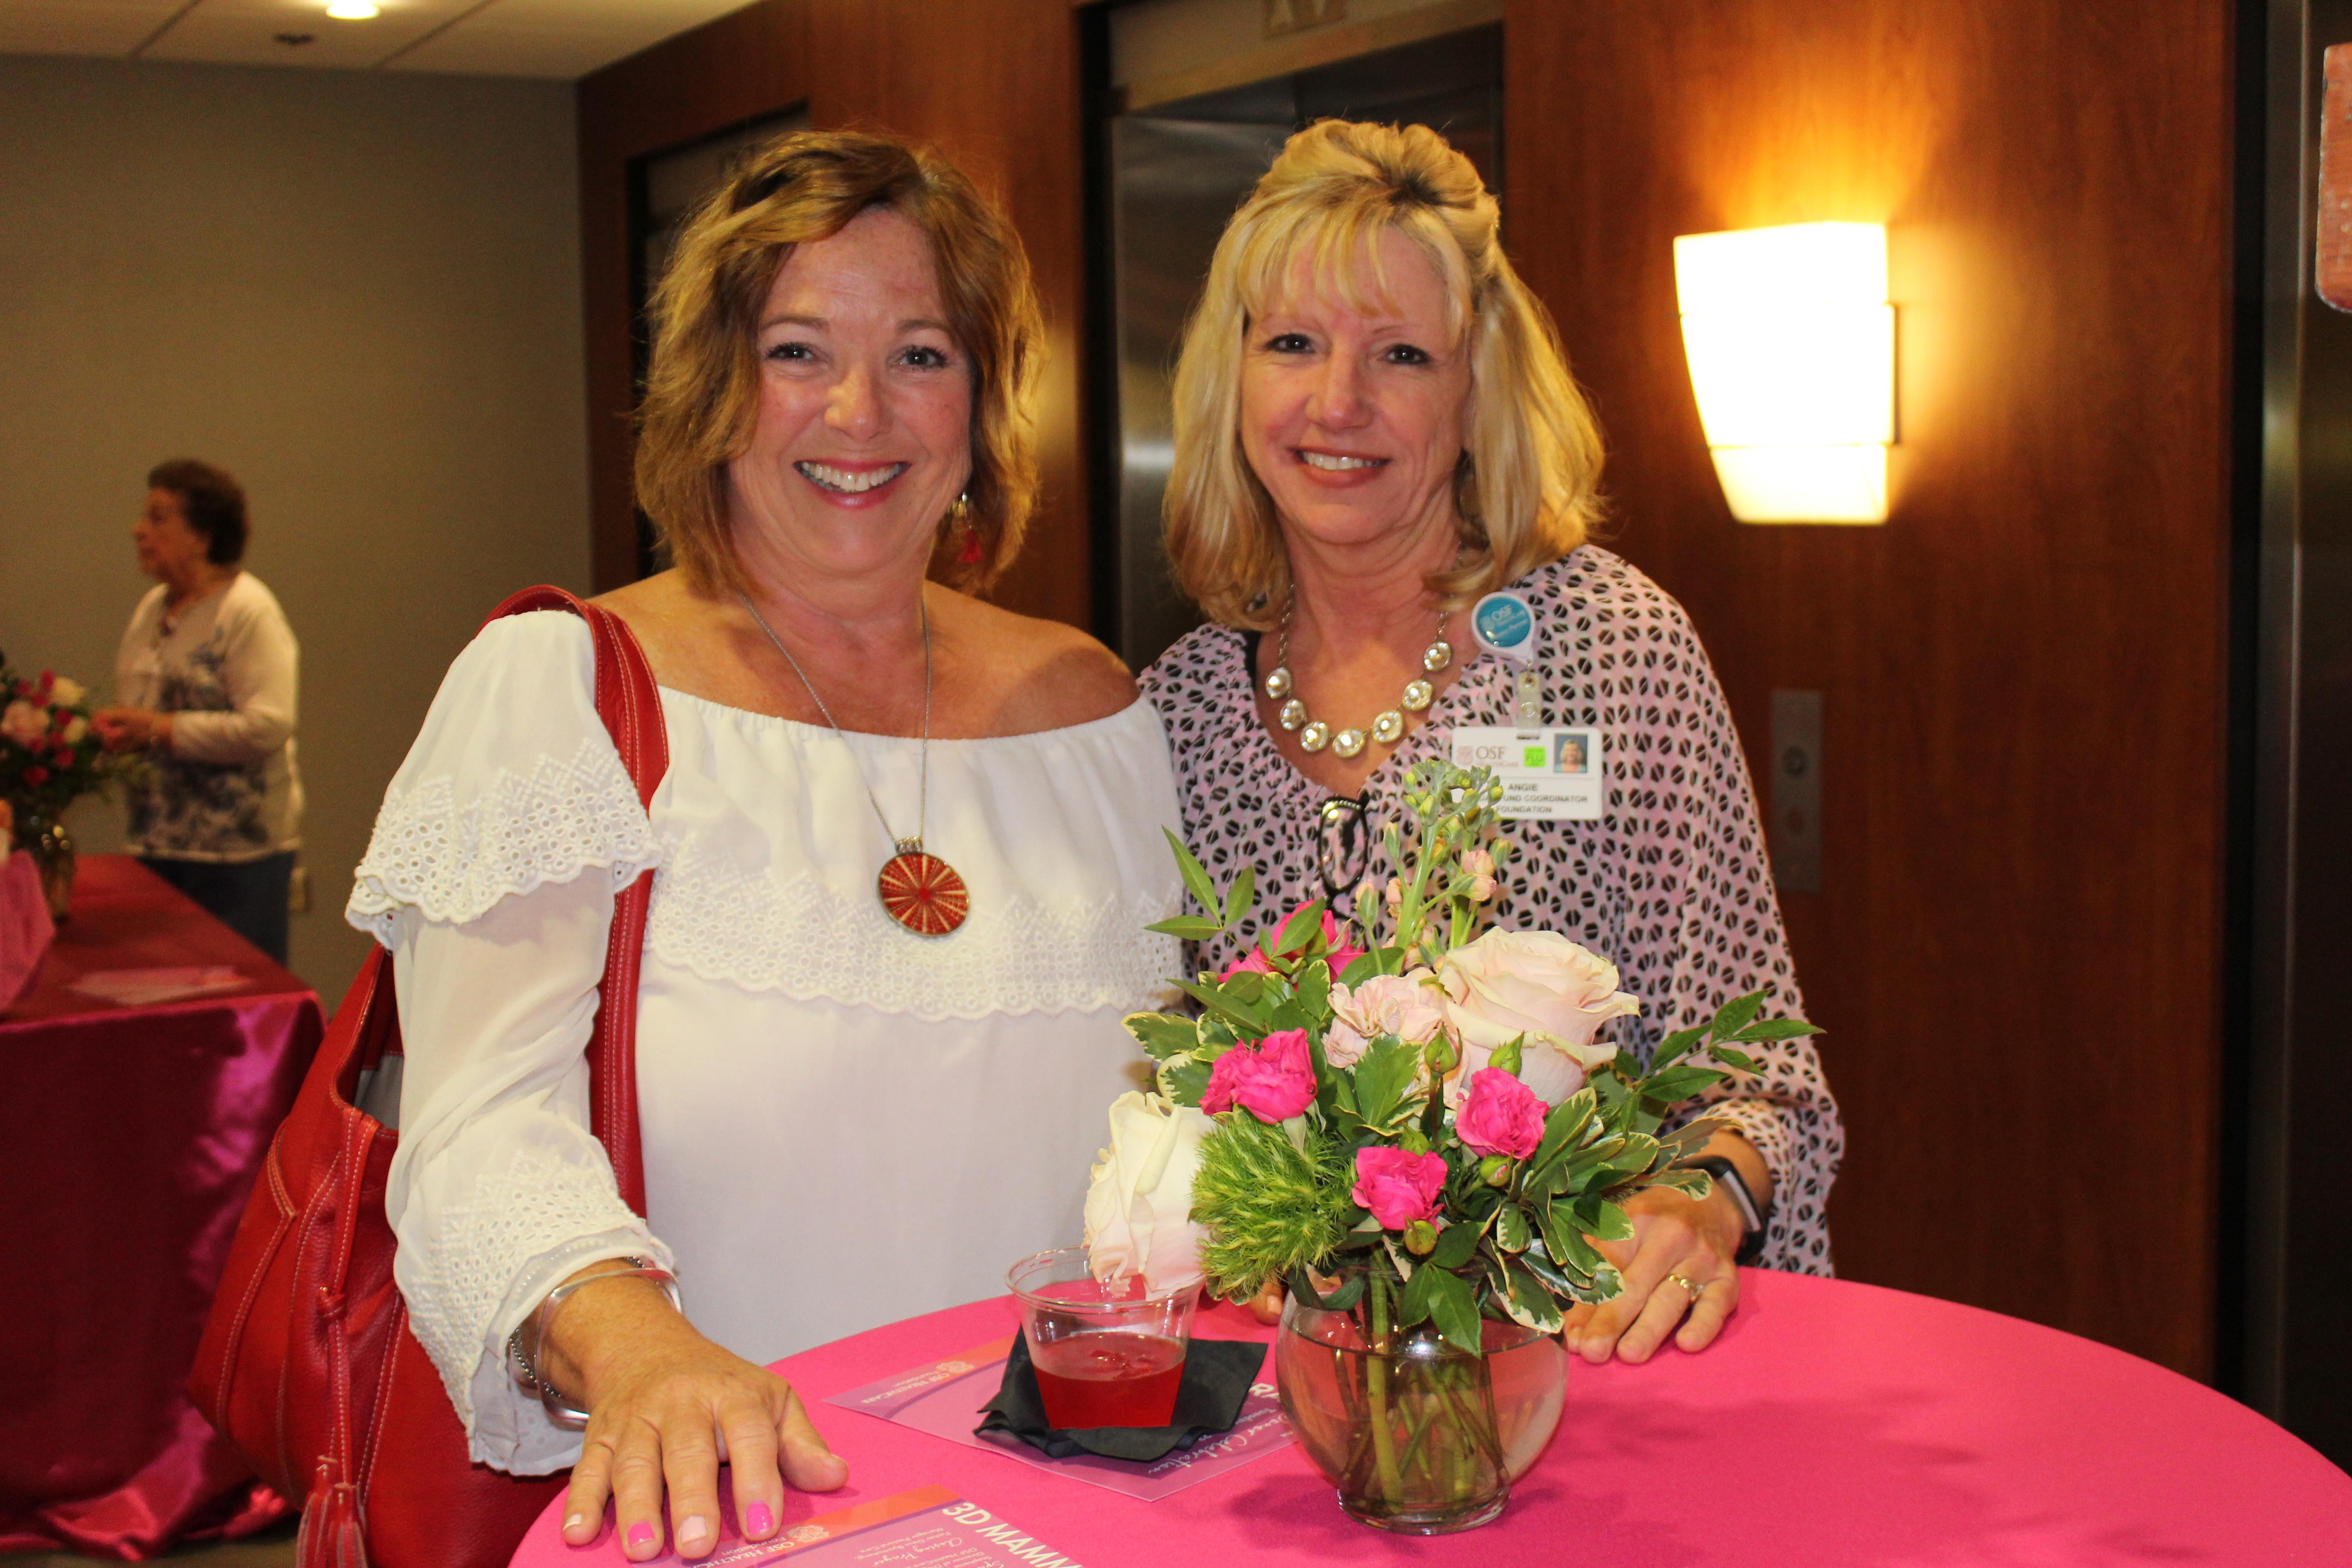 Cheryl Rotramel & Angie Lazzell